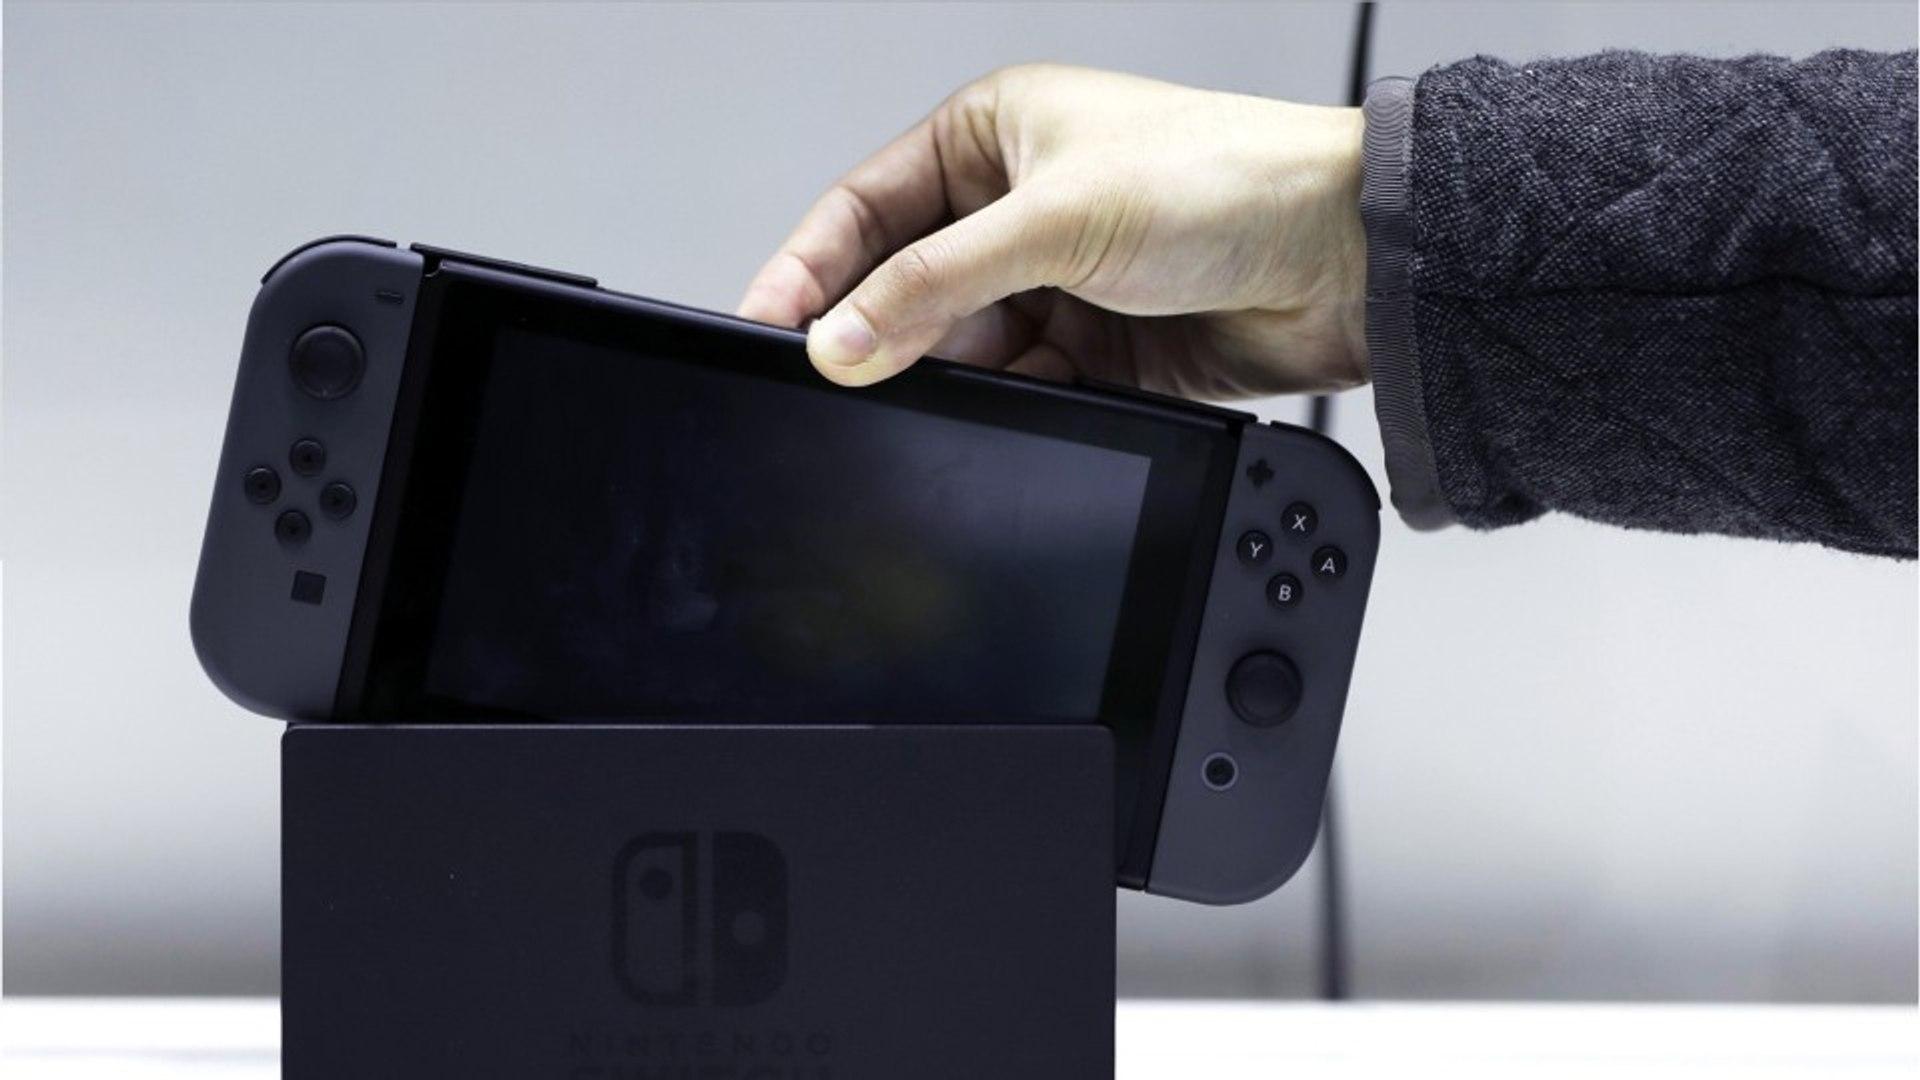 Nintendo Switch Tear Down Reveals DIY Friendly Console